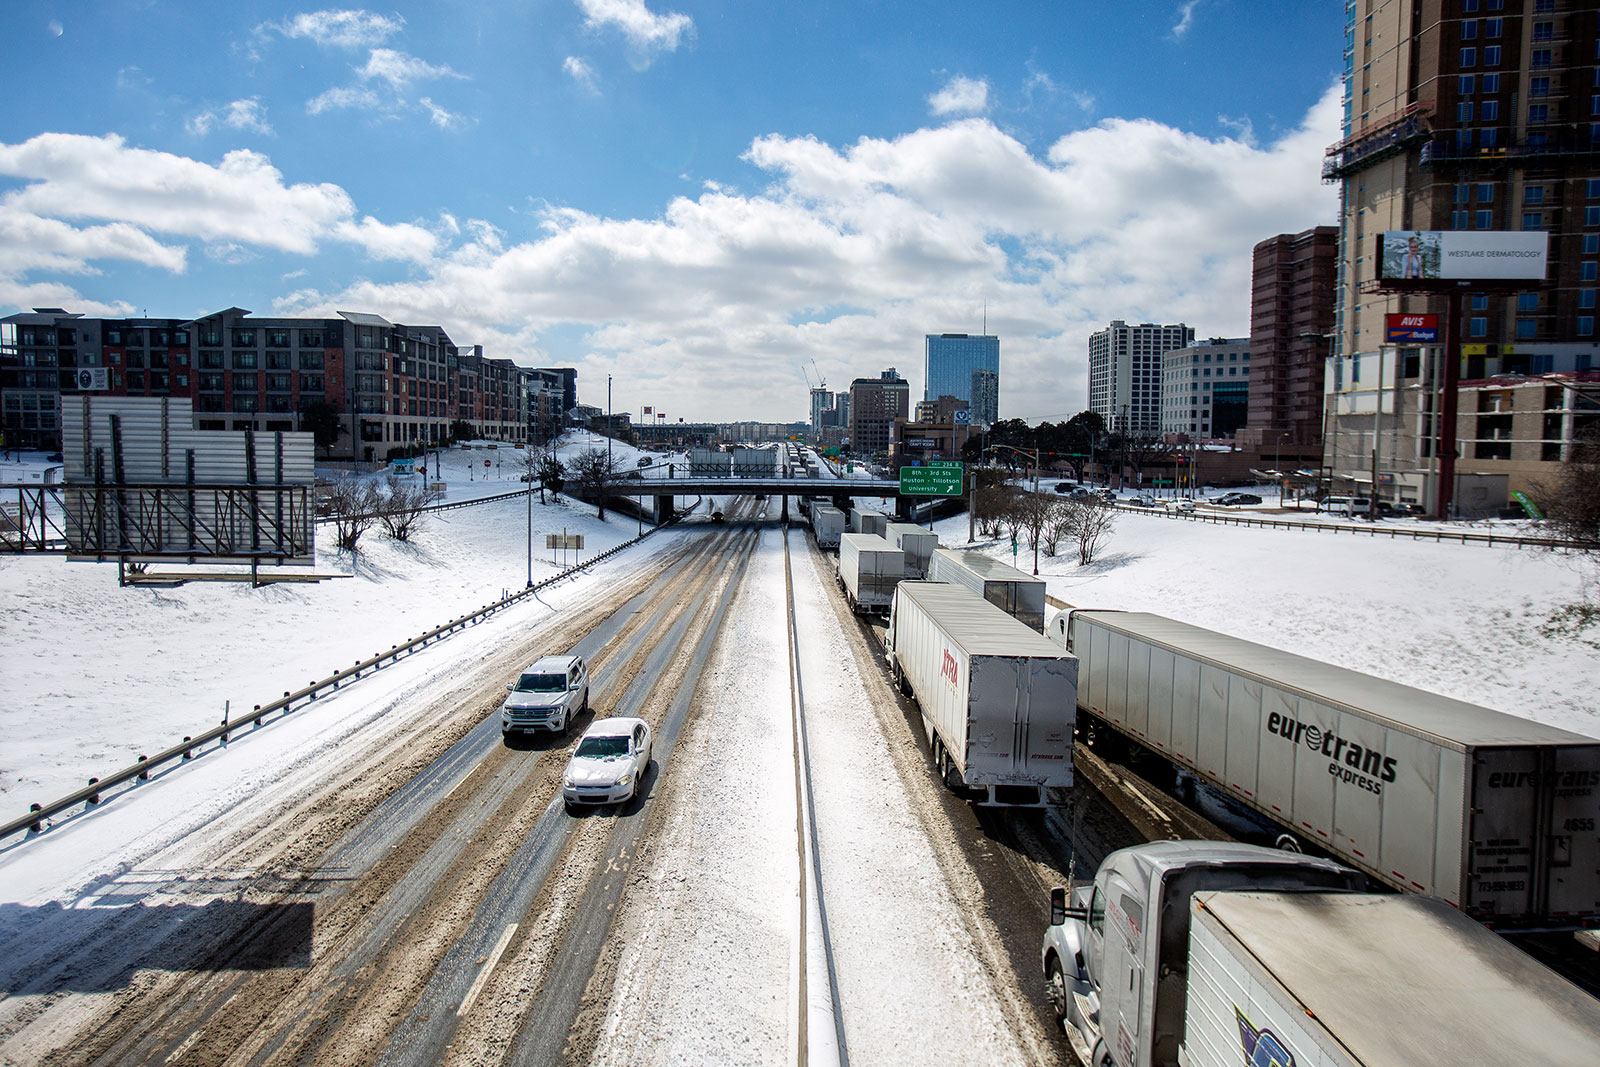 Motorists drive on I-35 in Austin, Texas, on February 15.